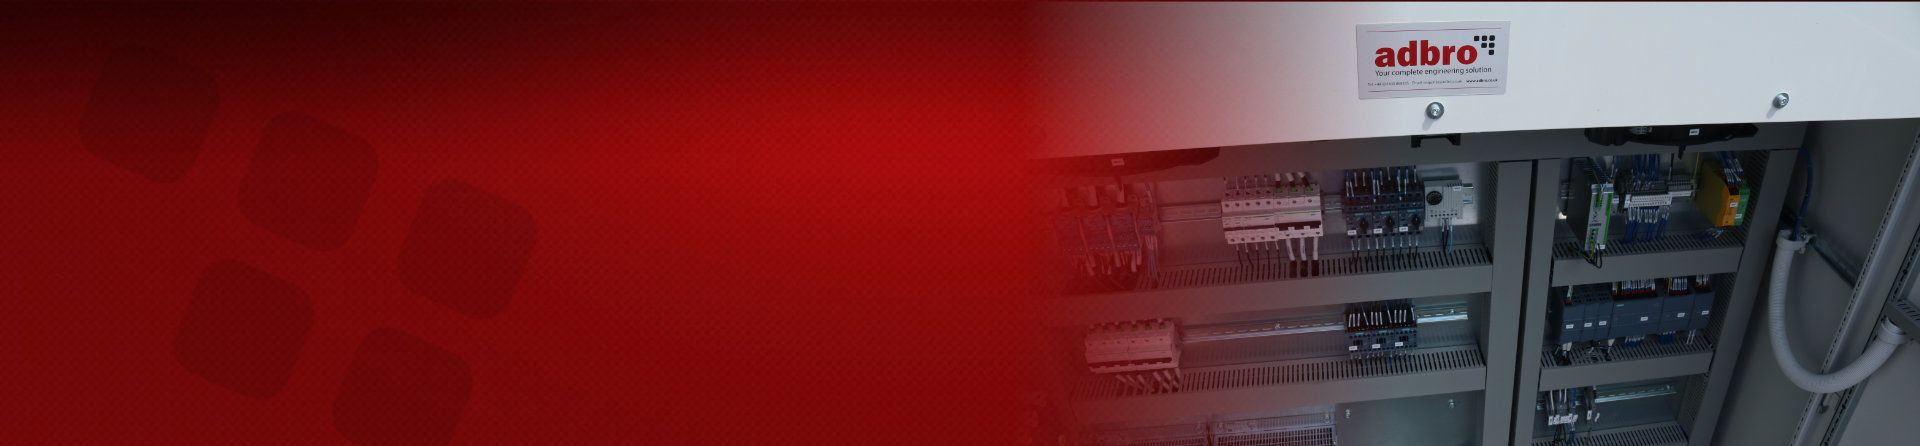 Control-Panels1.jpg